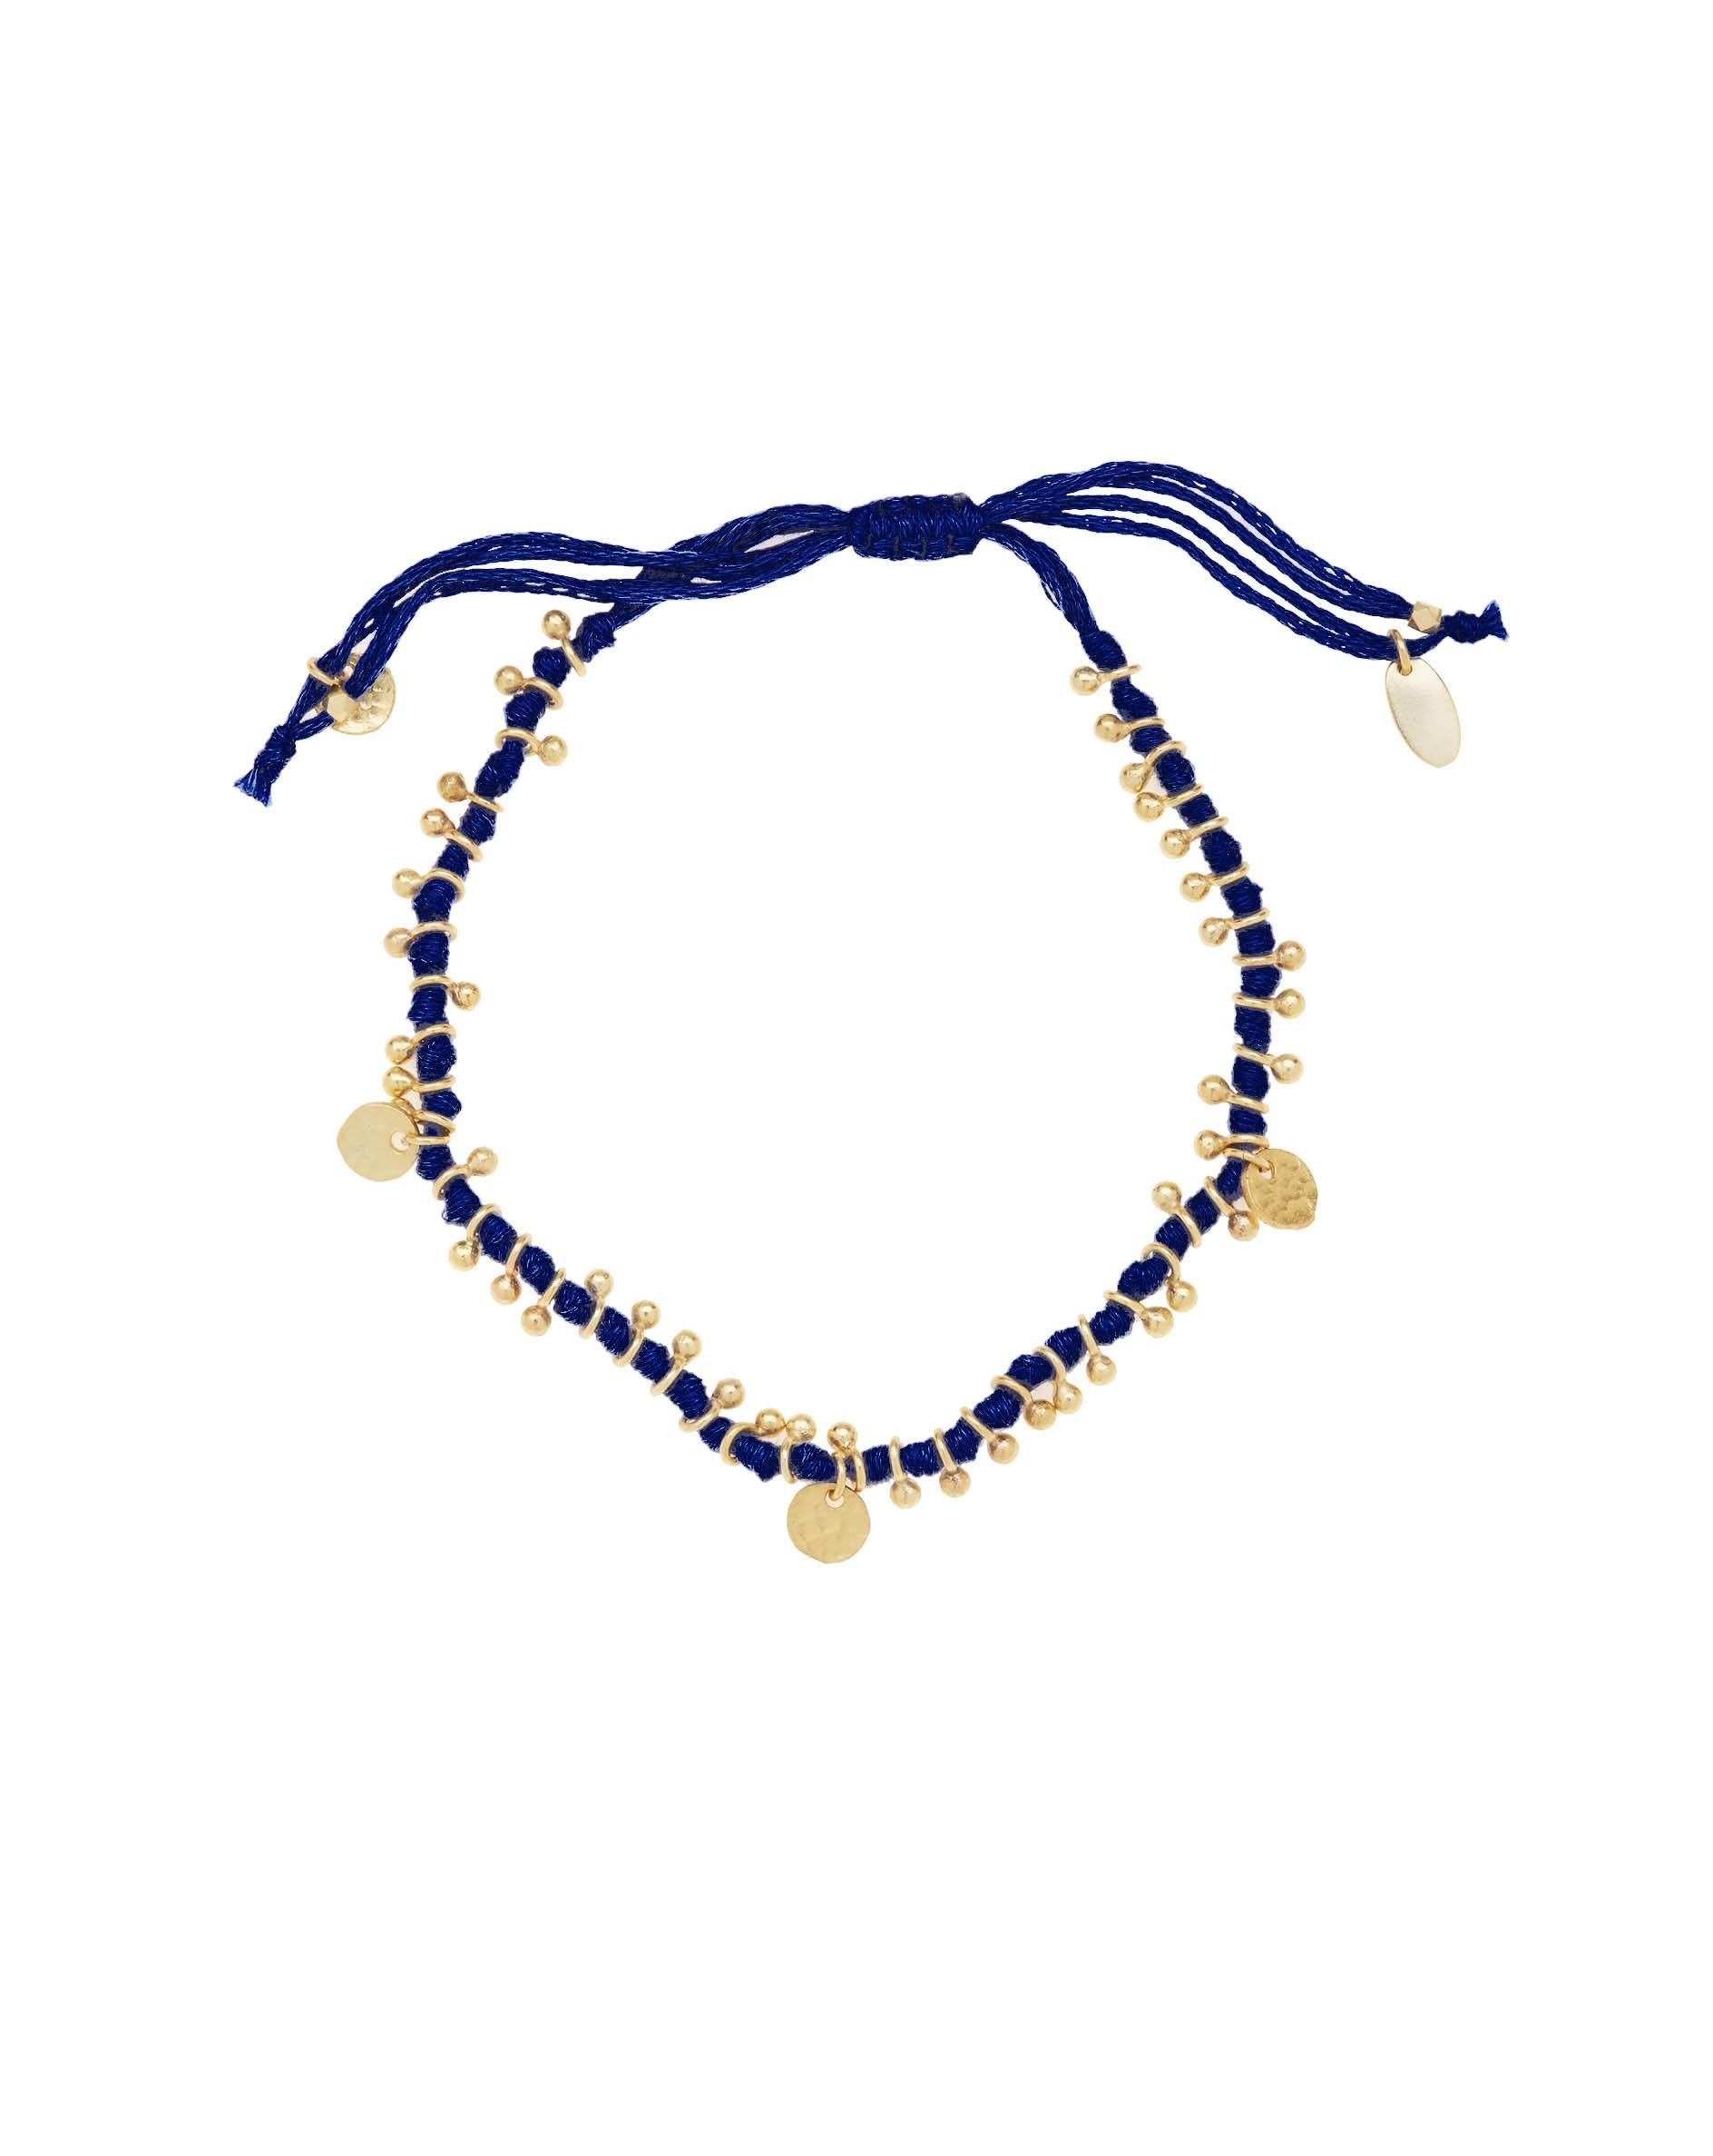 6e3fe48a5bba4 Gold plated adjustable cord bracelet by Ashiana London